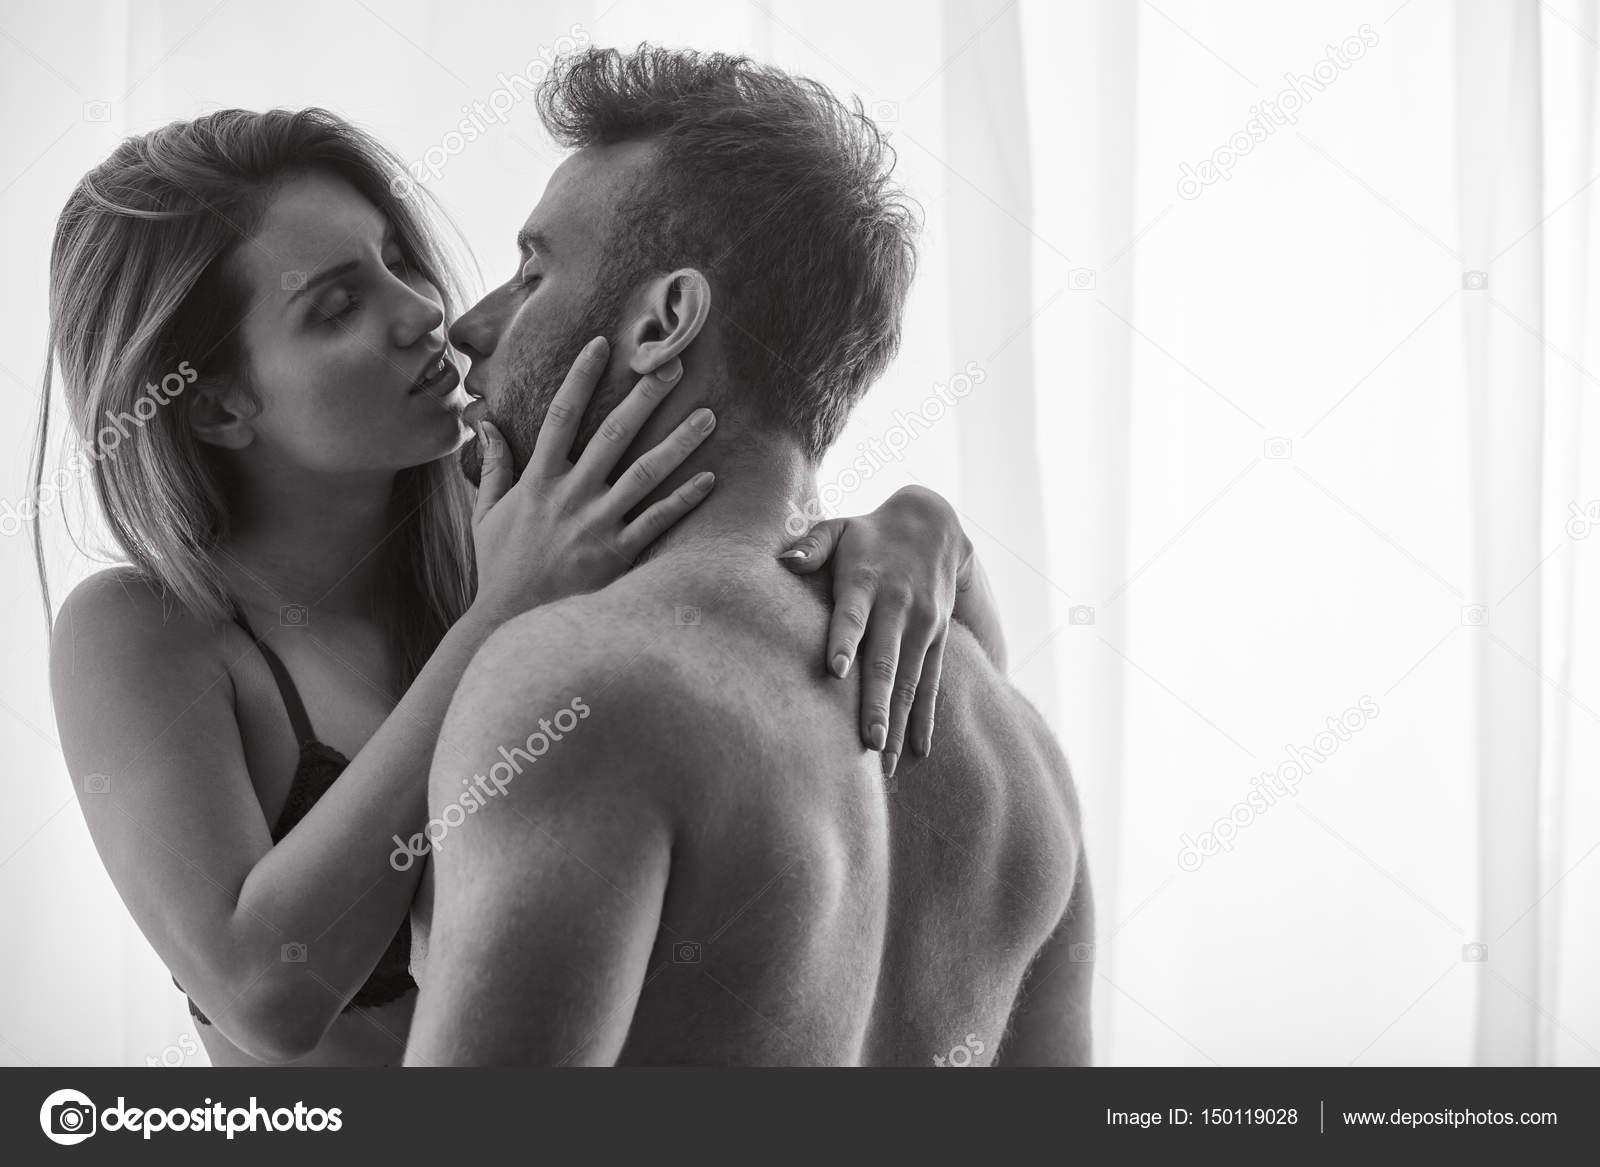 woman kissing the naked man — stock photo © photographee.eu #150119028